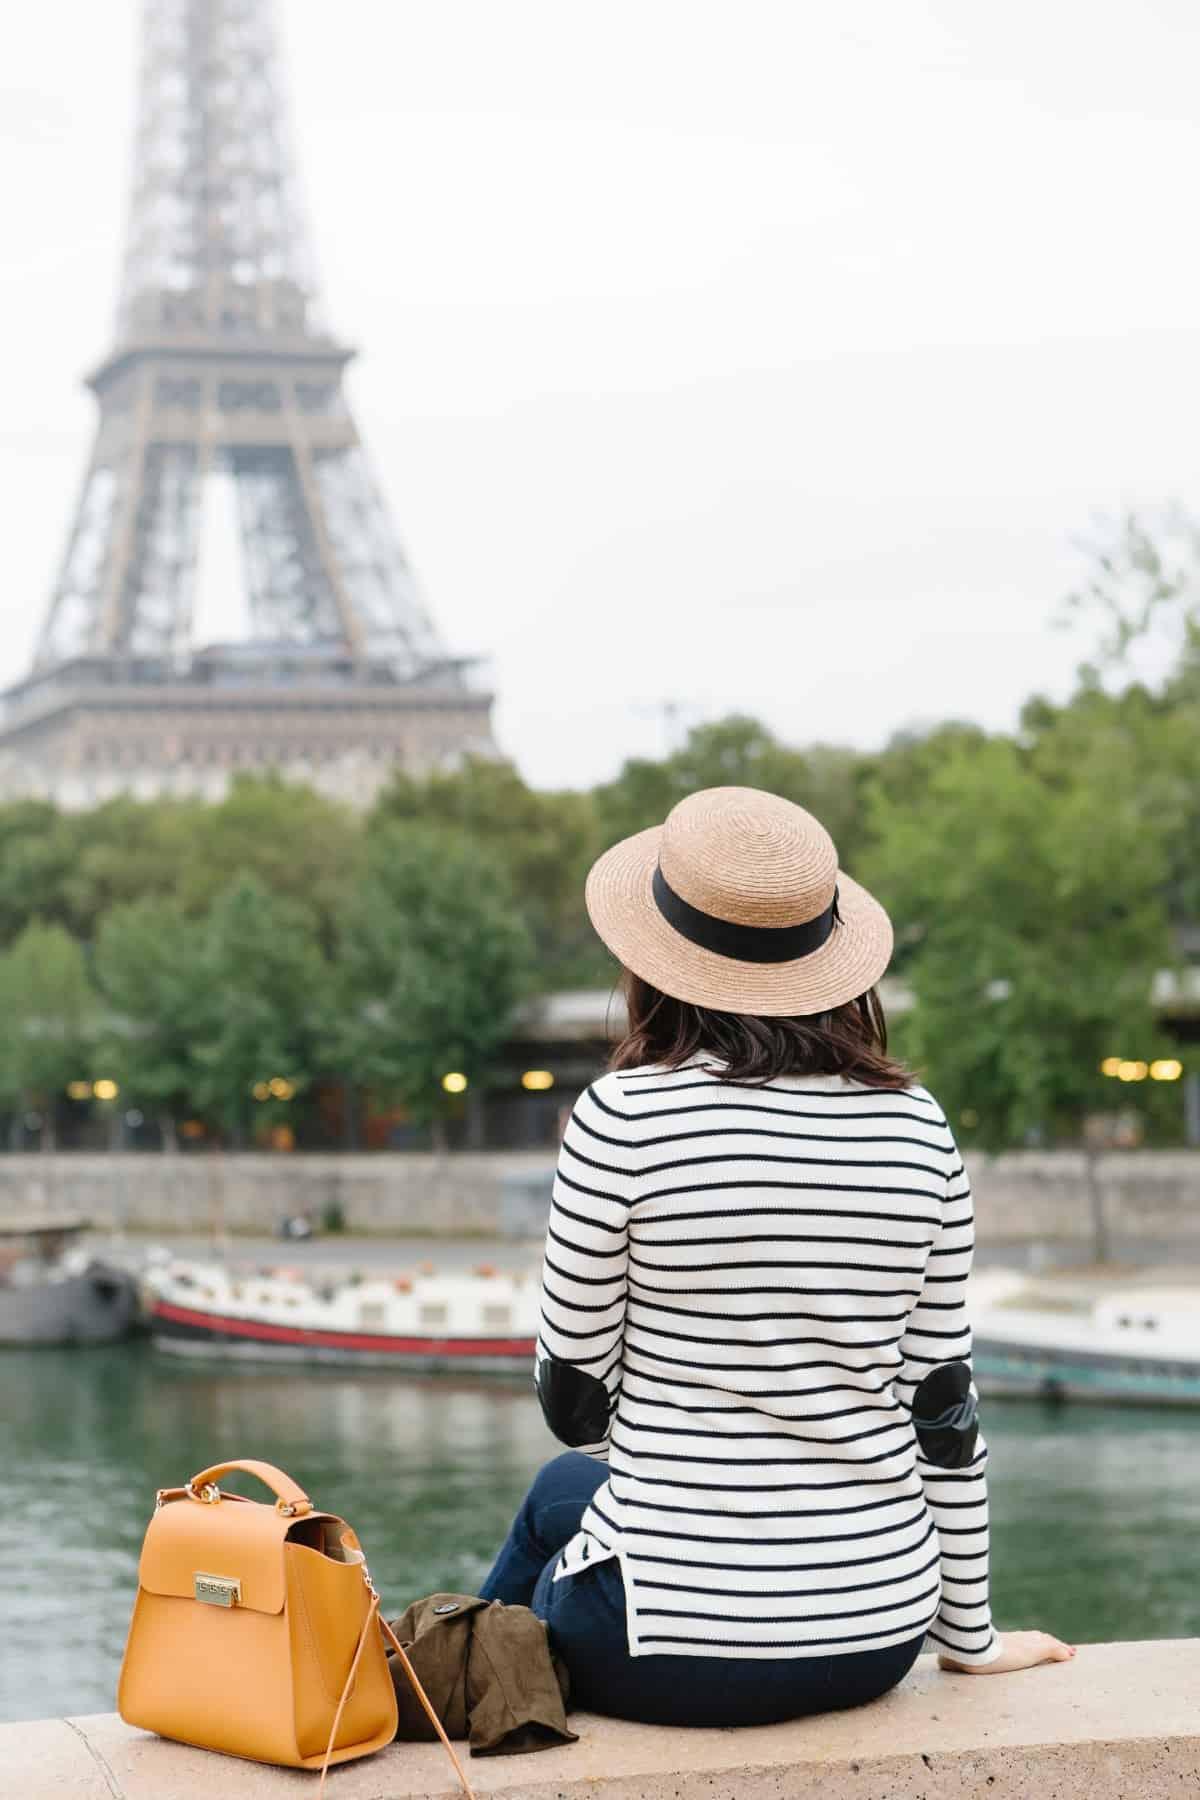 Eiffel Tower photo ideas, outfit ideas for Paris - My Style Vita @mystylevita